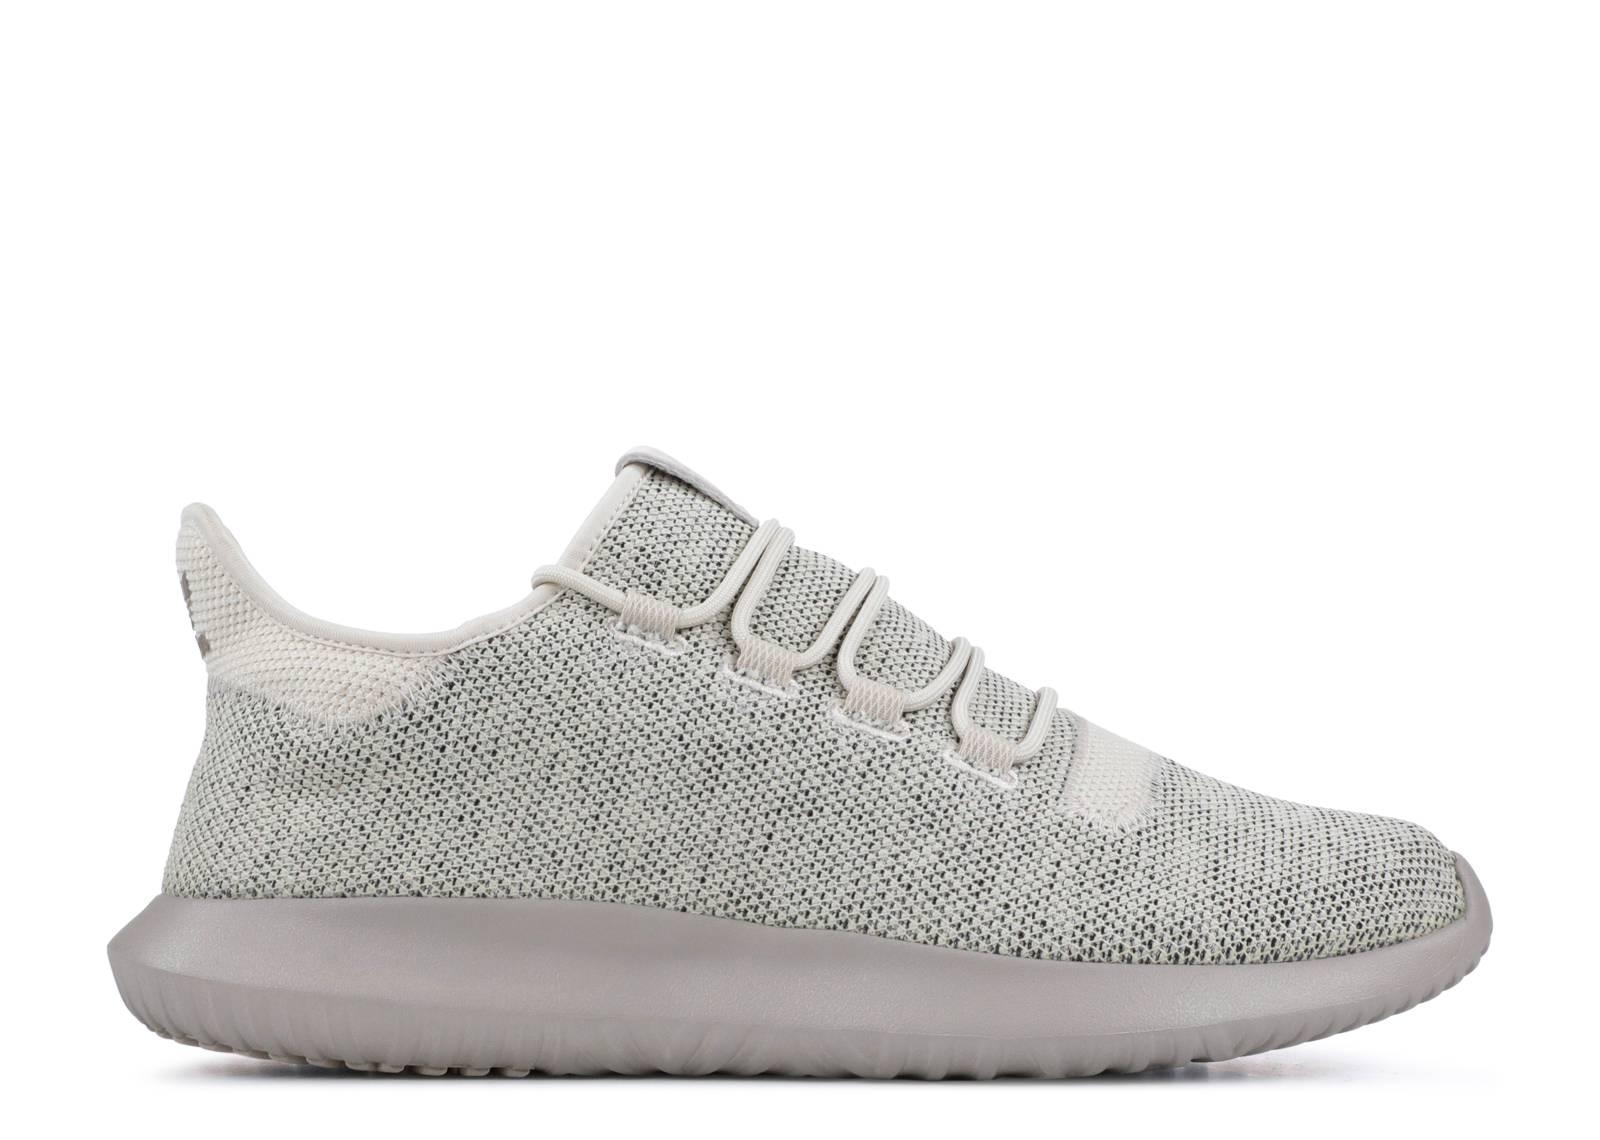 adidas tubular shadow grey light